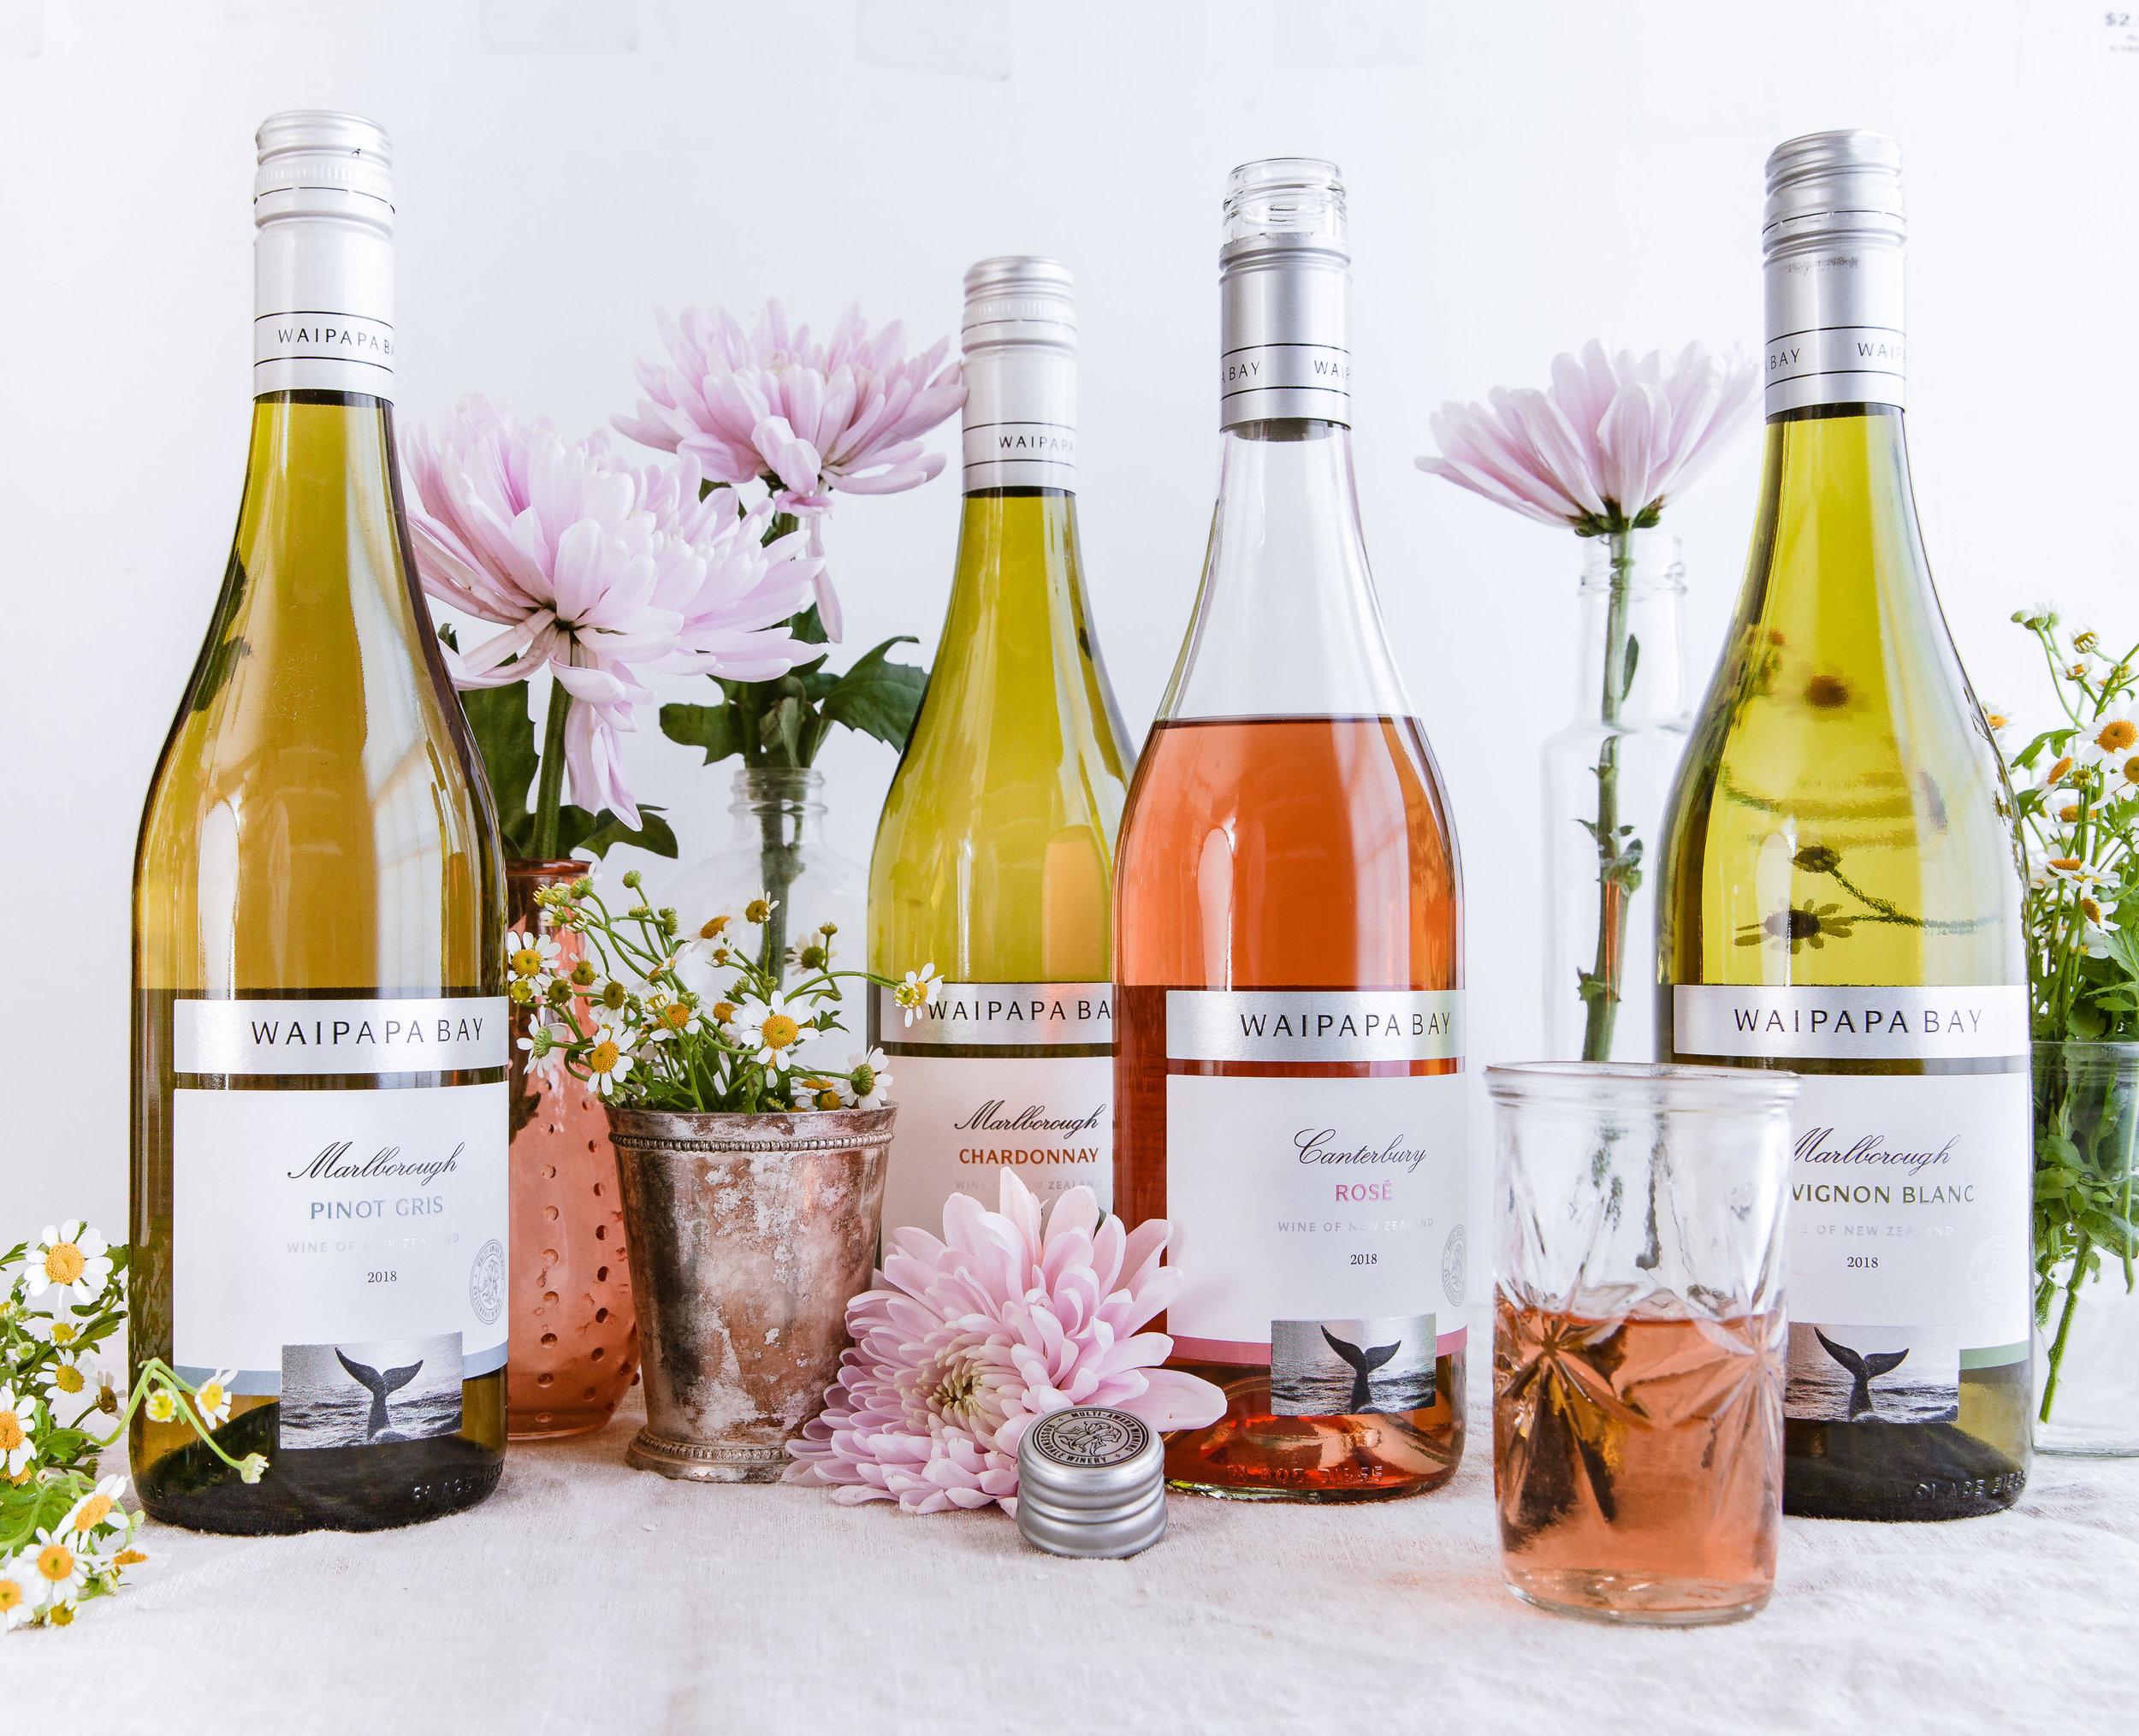 Waipapa wines Social Media images by los angeles food photographer Sarah Ehlinger